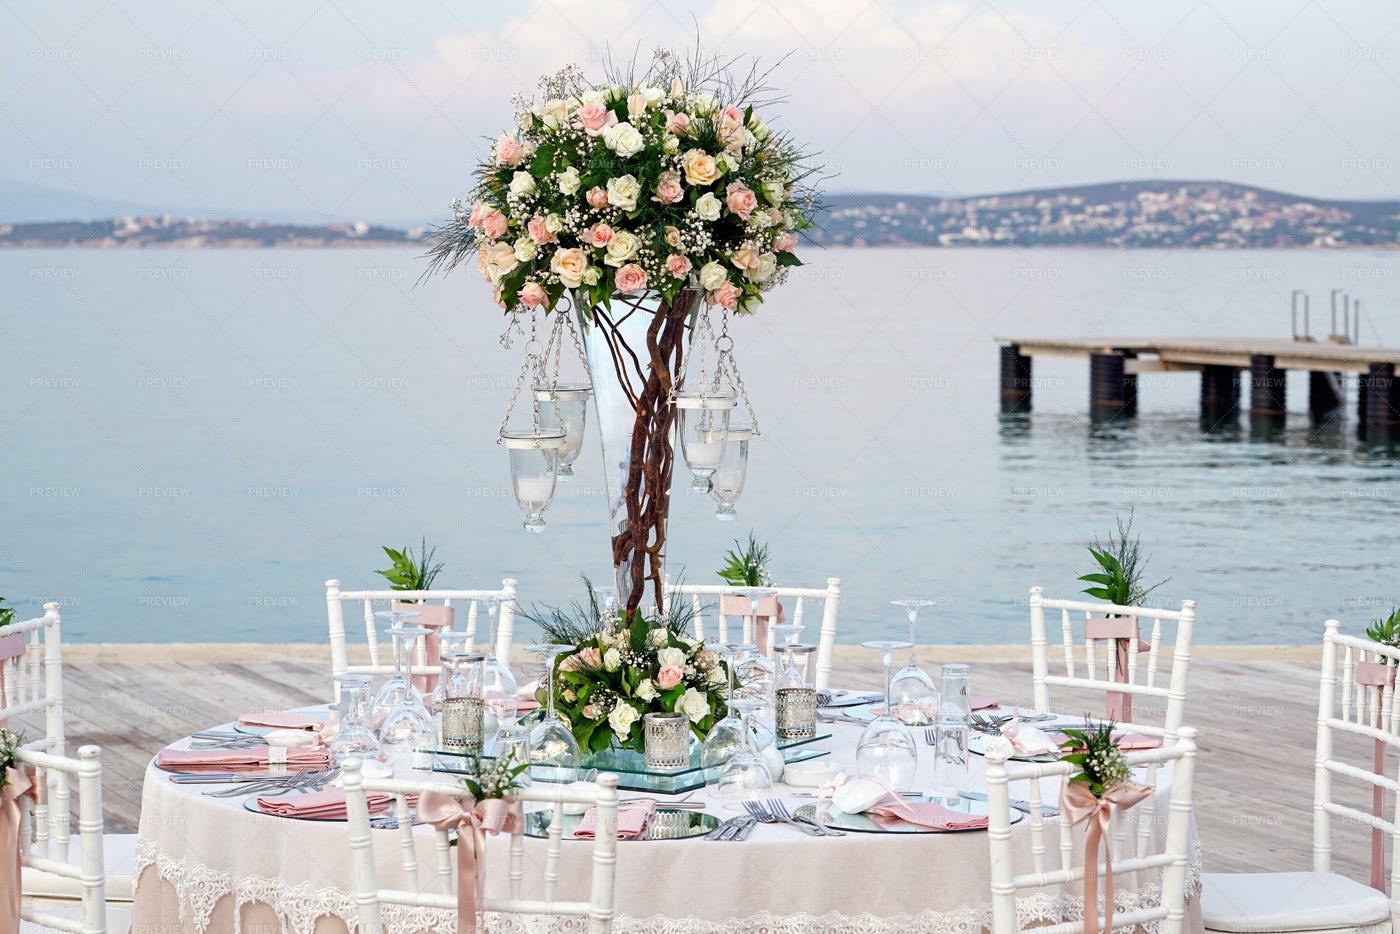 Wedding Table By The Sea: Stock Photos